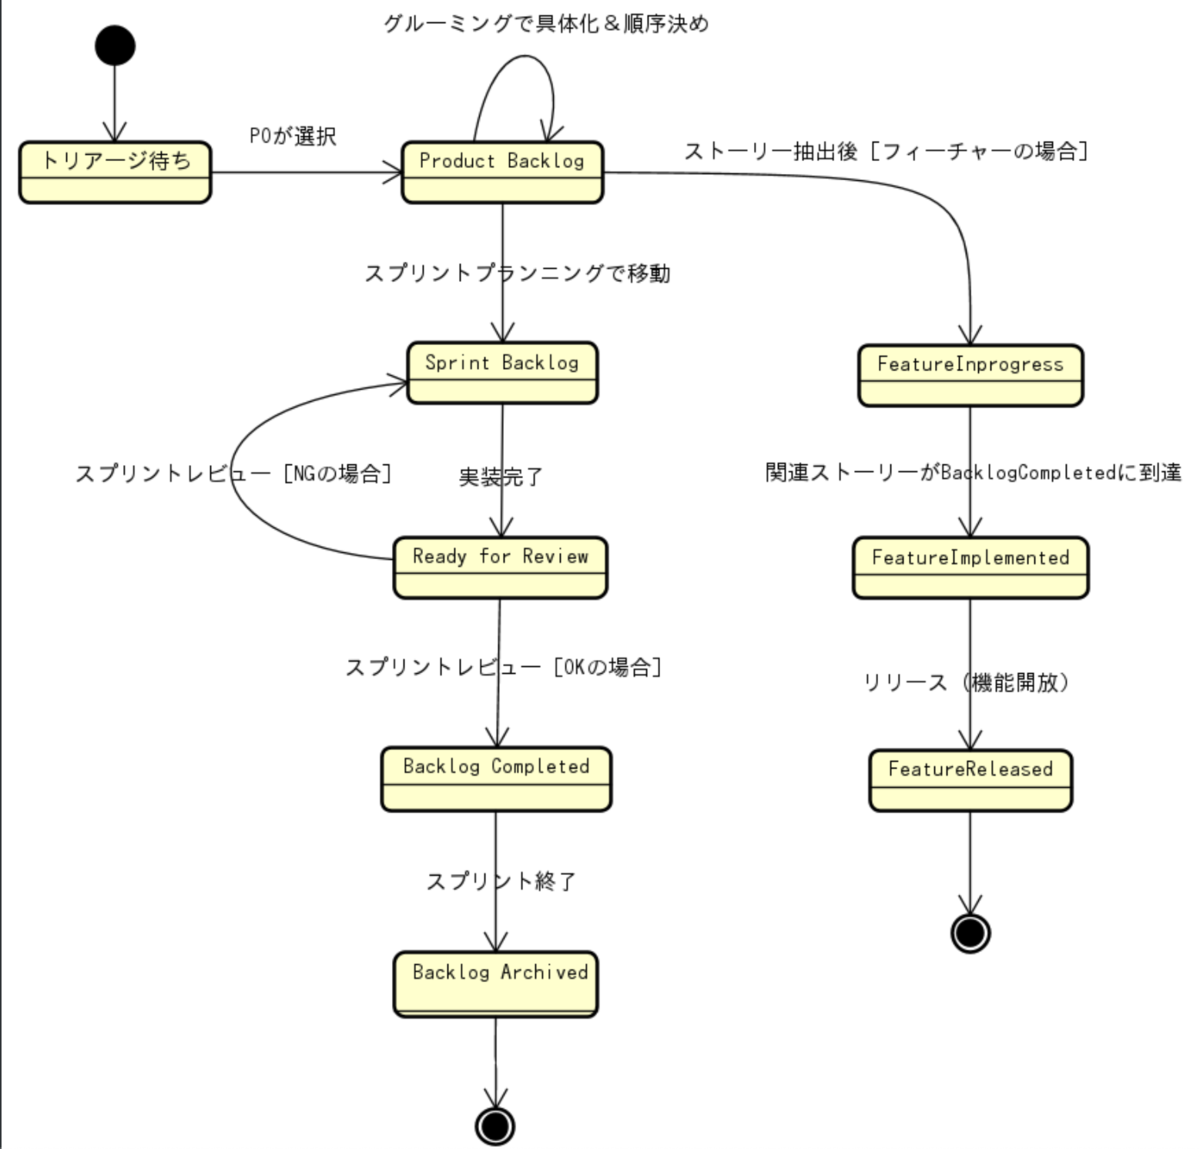 f:id:yuichi31:20201211165855p:plain